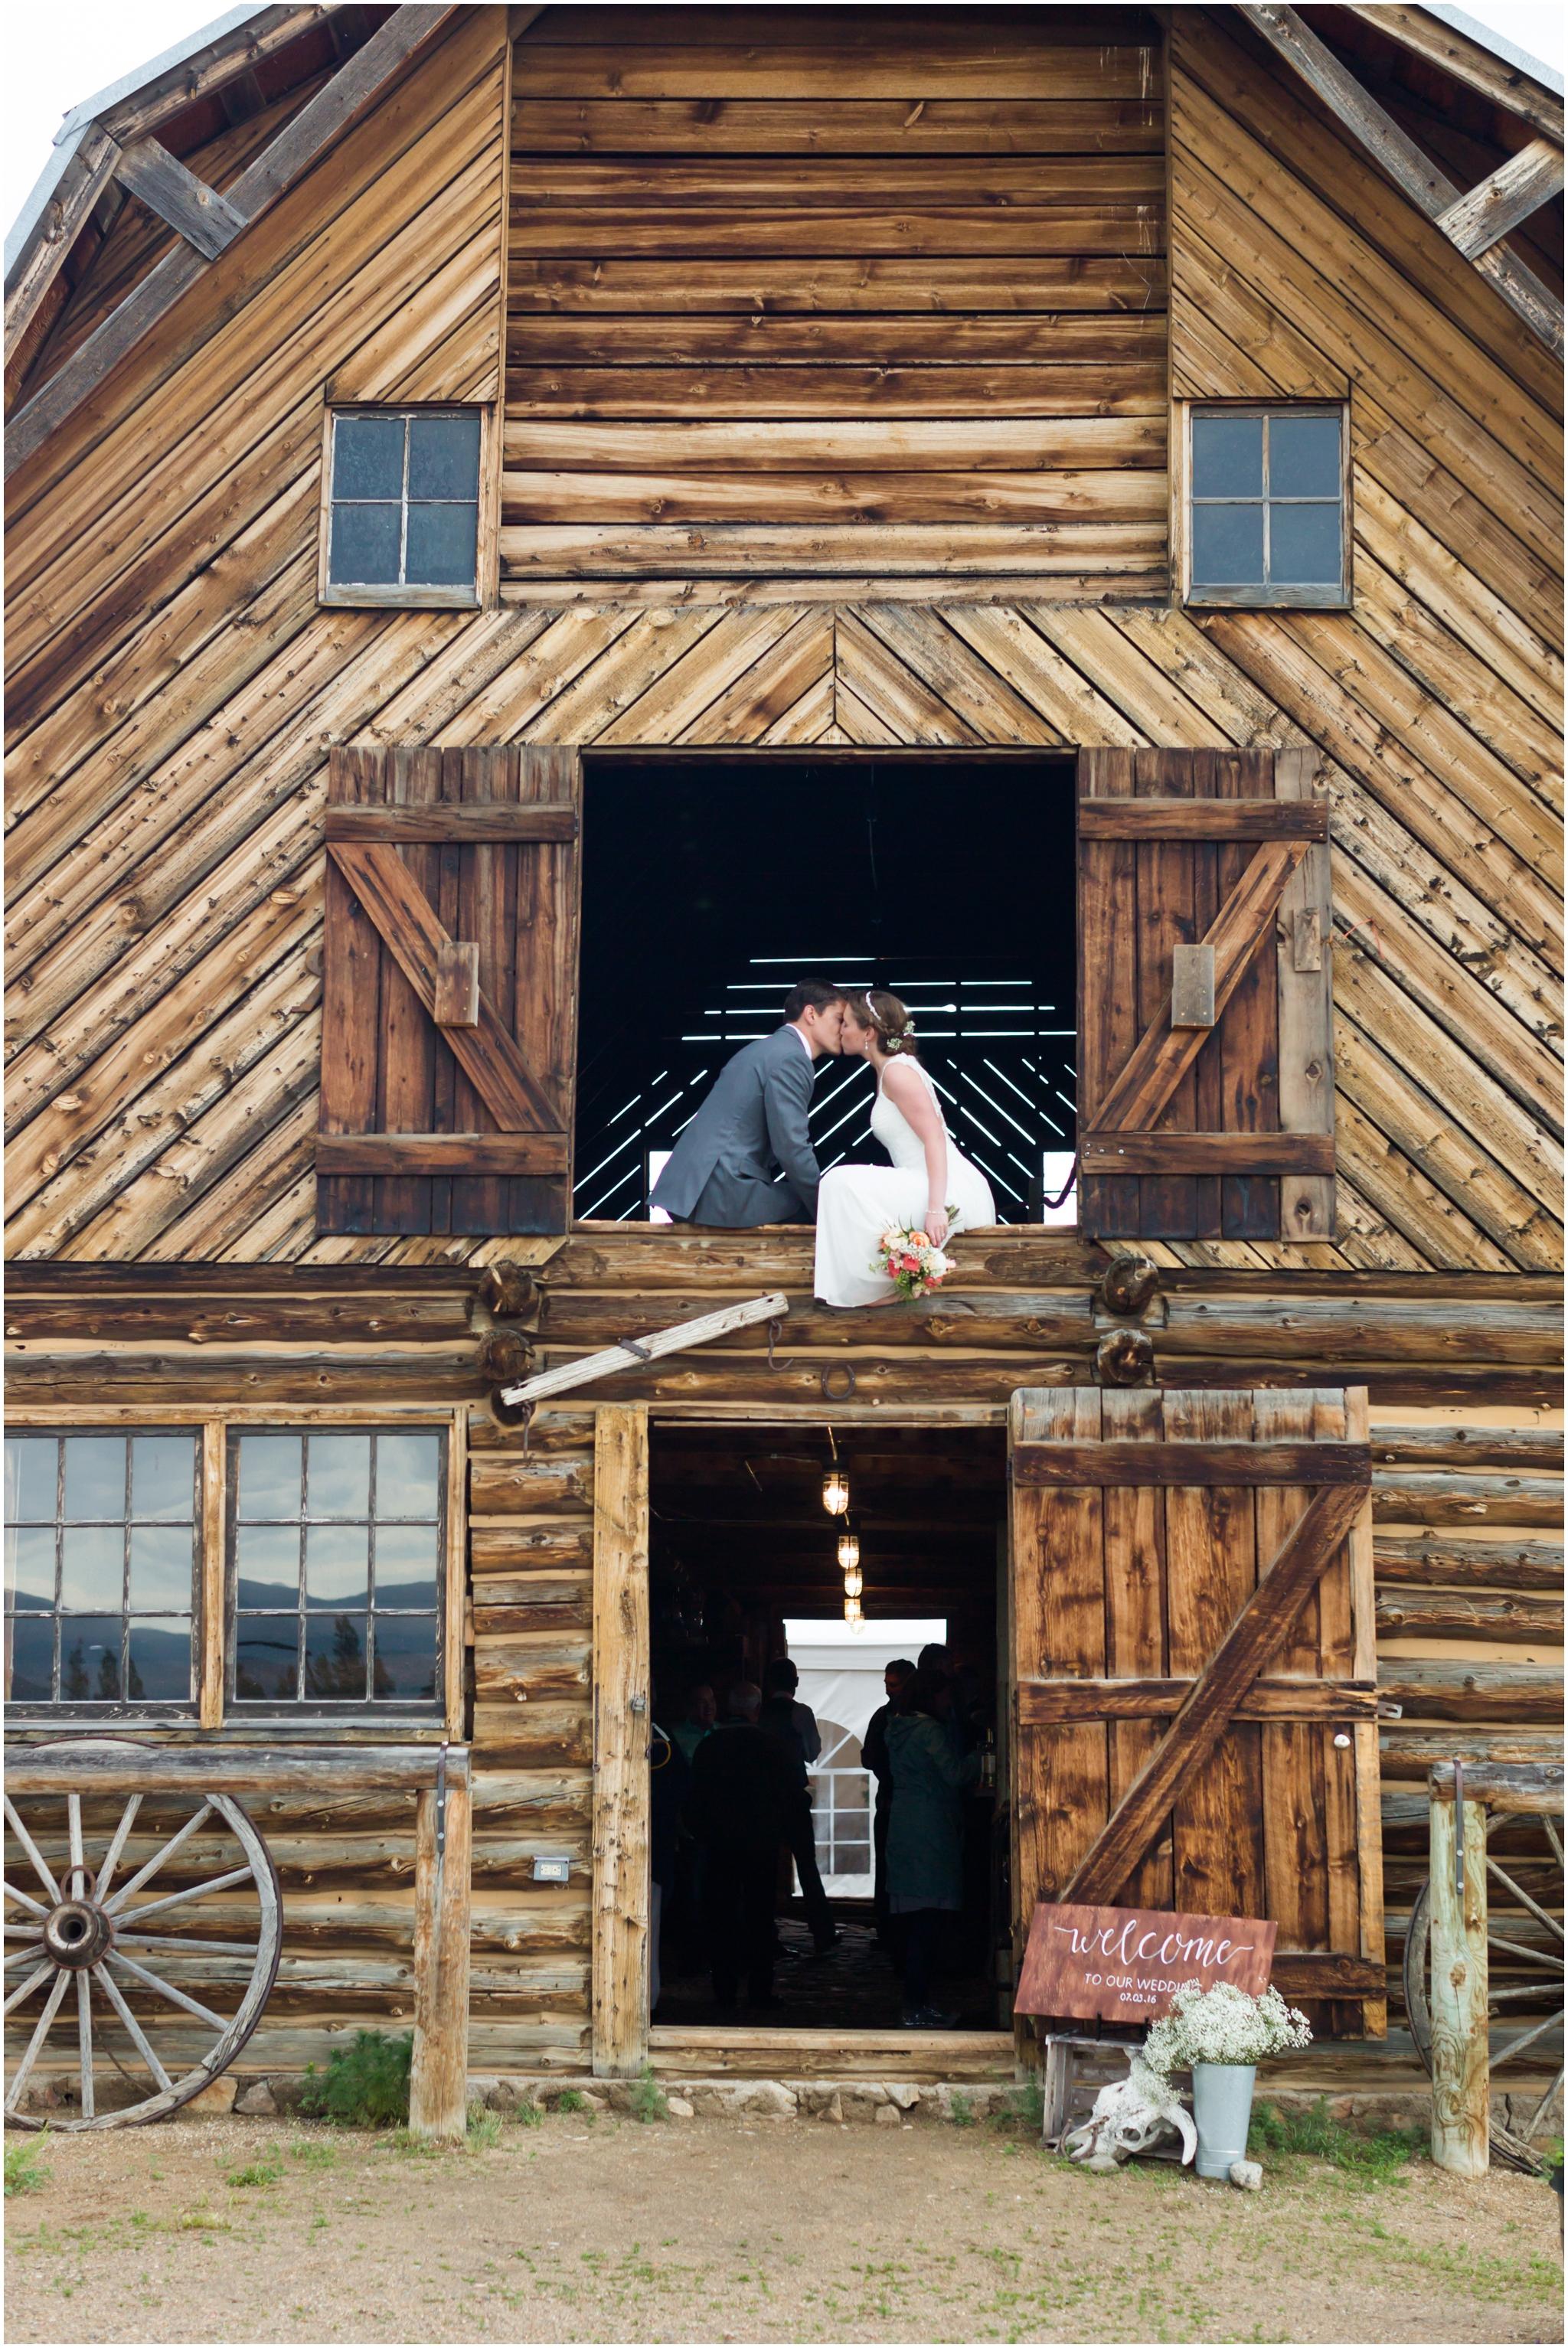 Strawberry_Creek_Ranch_Wedding_Photographer24.jpg